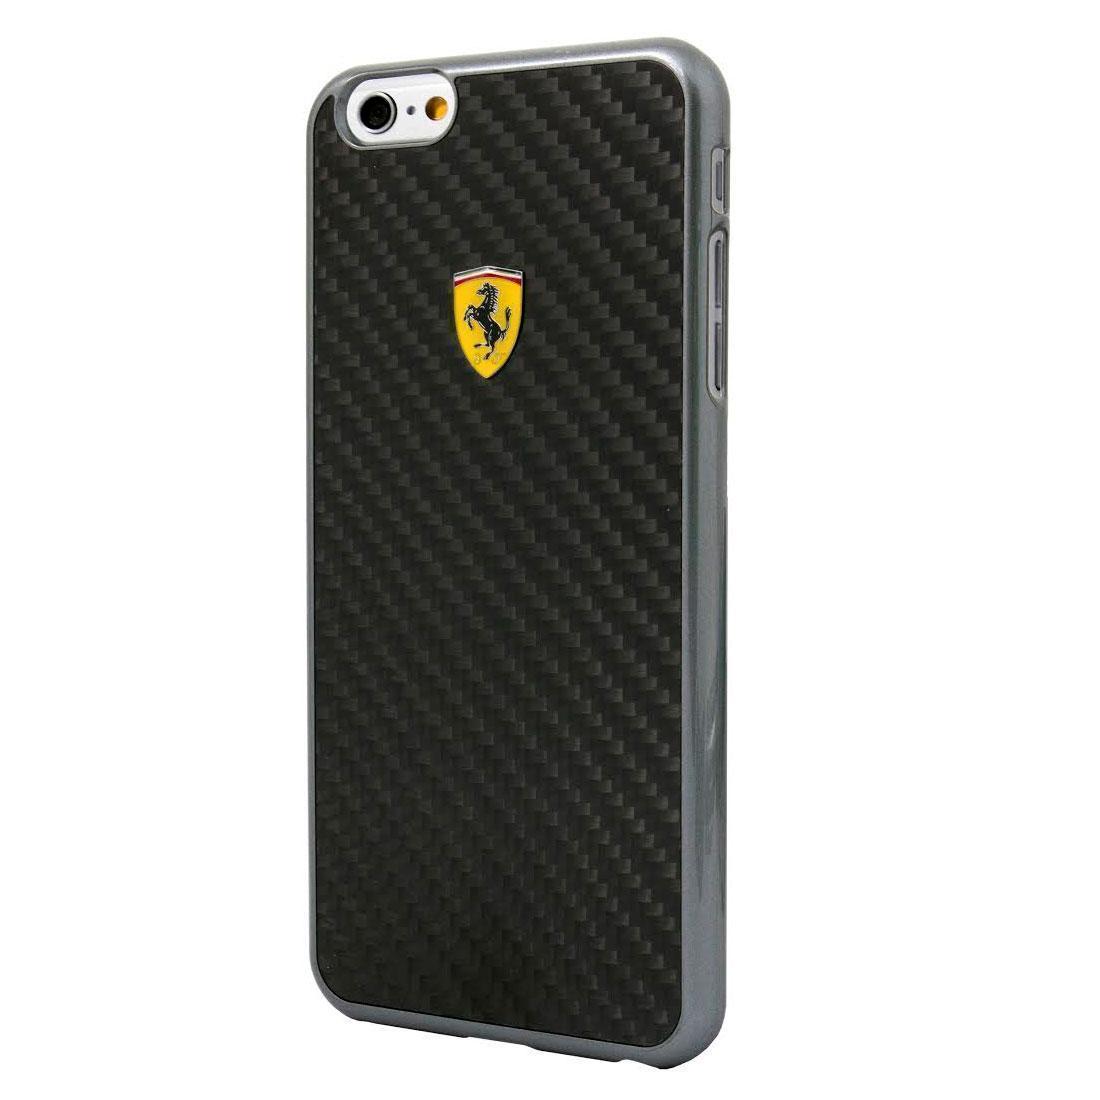 Чехол-накладка Ferrari Formula Real Fiber Carbon для Apple iPhone 6 Plus/6S Plus Blackдля iPhone 6 Plus/6S Plus<br>Чехол-накладка Ferrari Formula Real Fiber Carbon для Apple iPhone 6 Plus/6S Plus Black<br>